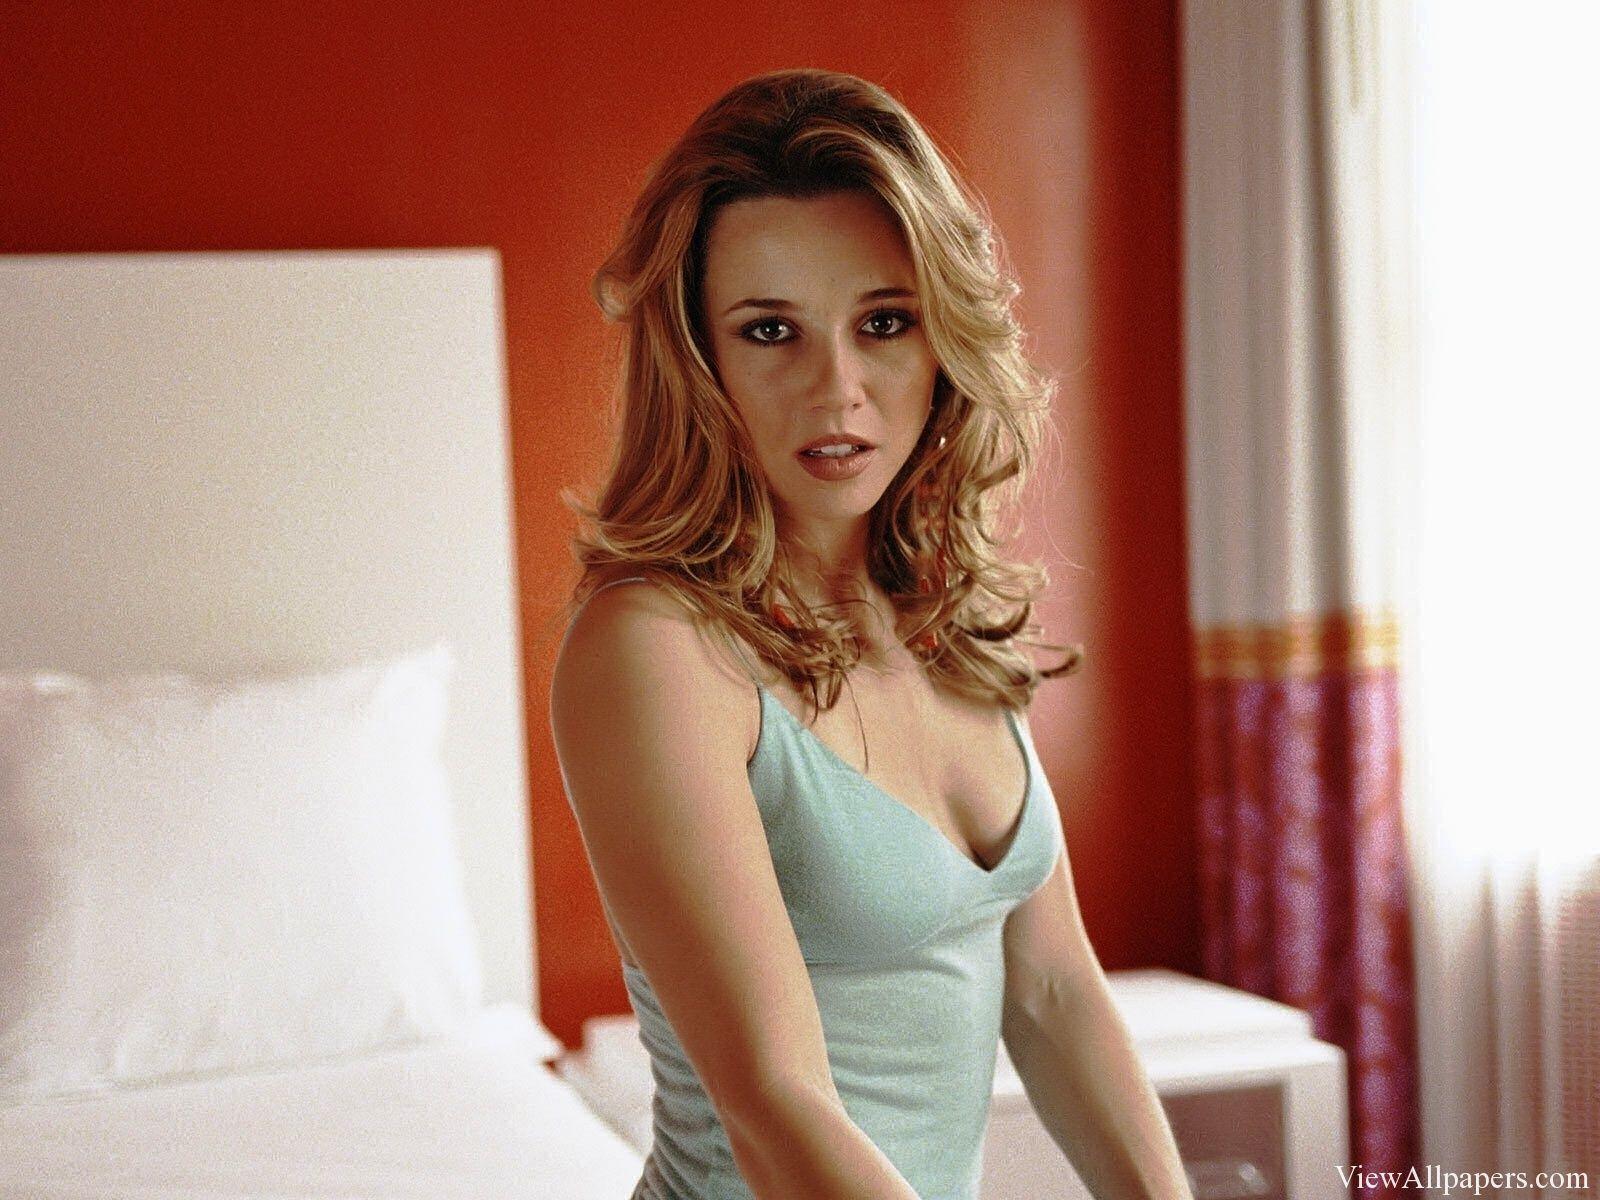 Linda Cardellini Tits 34